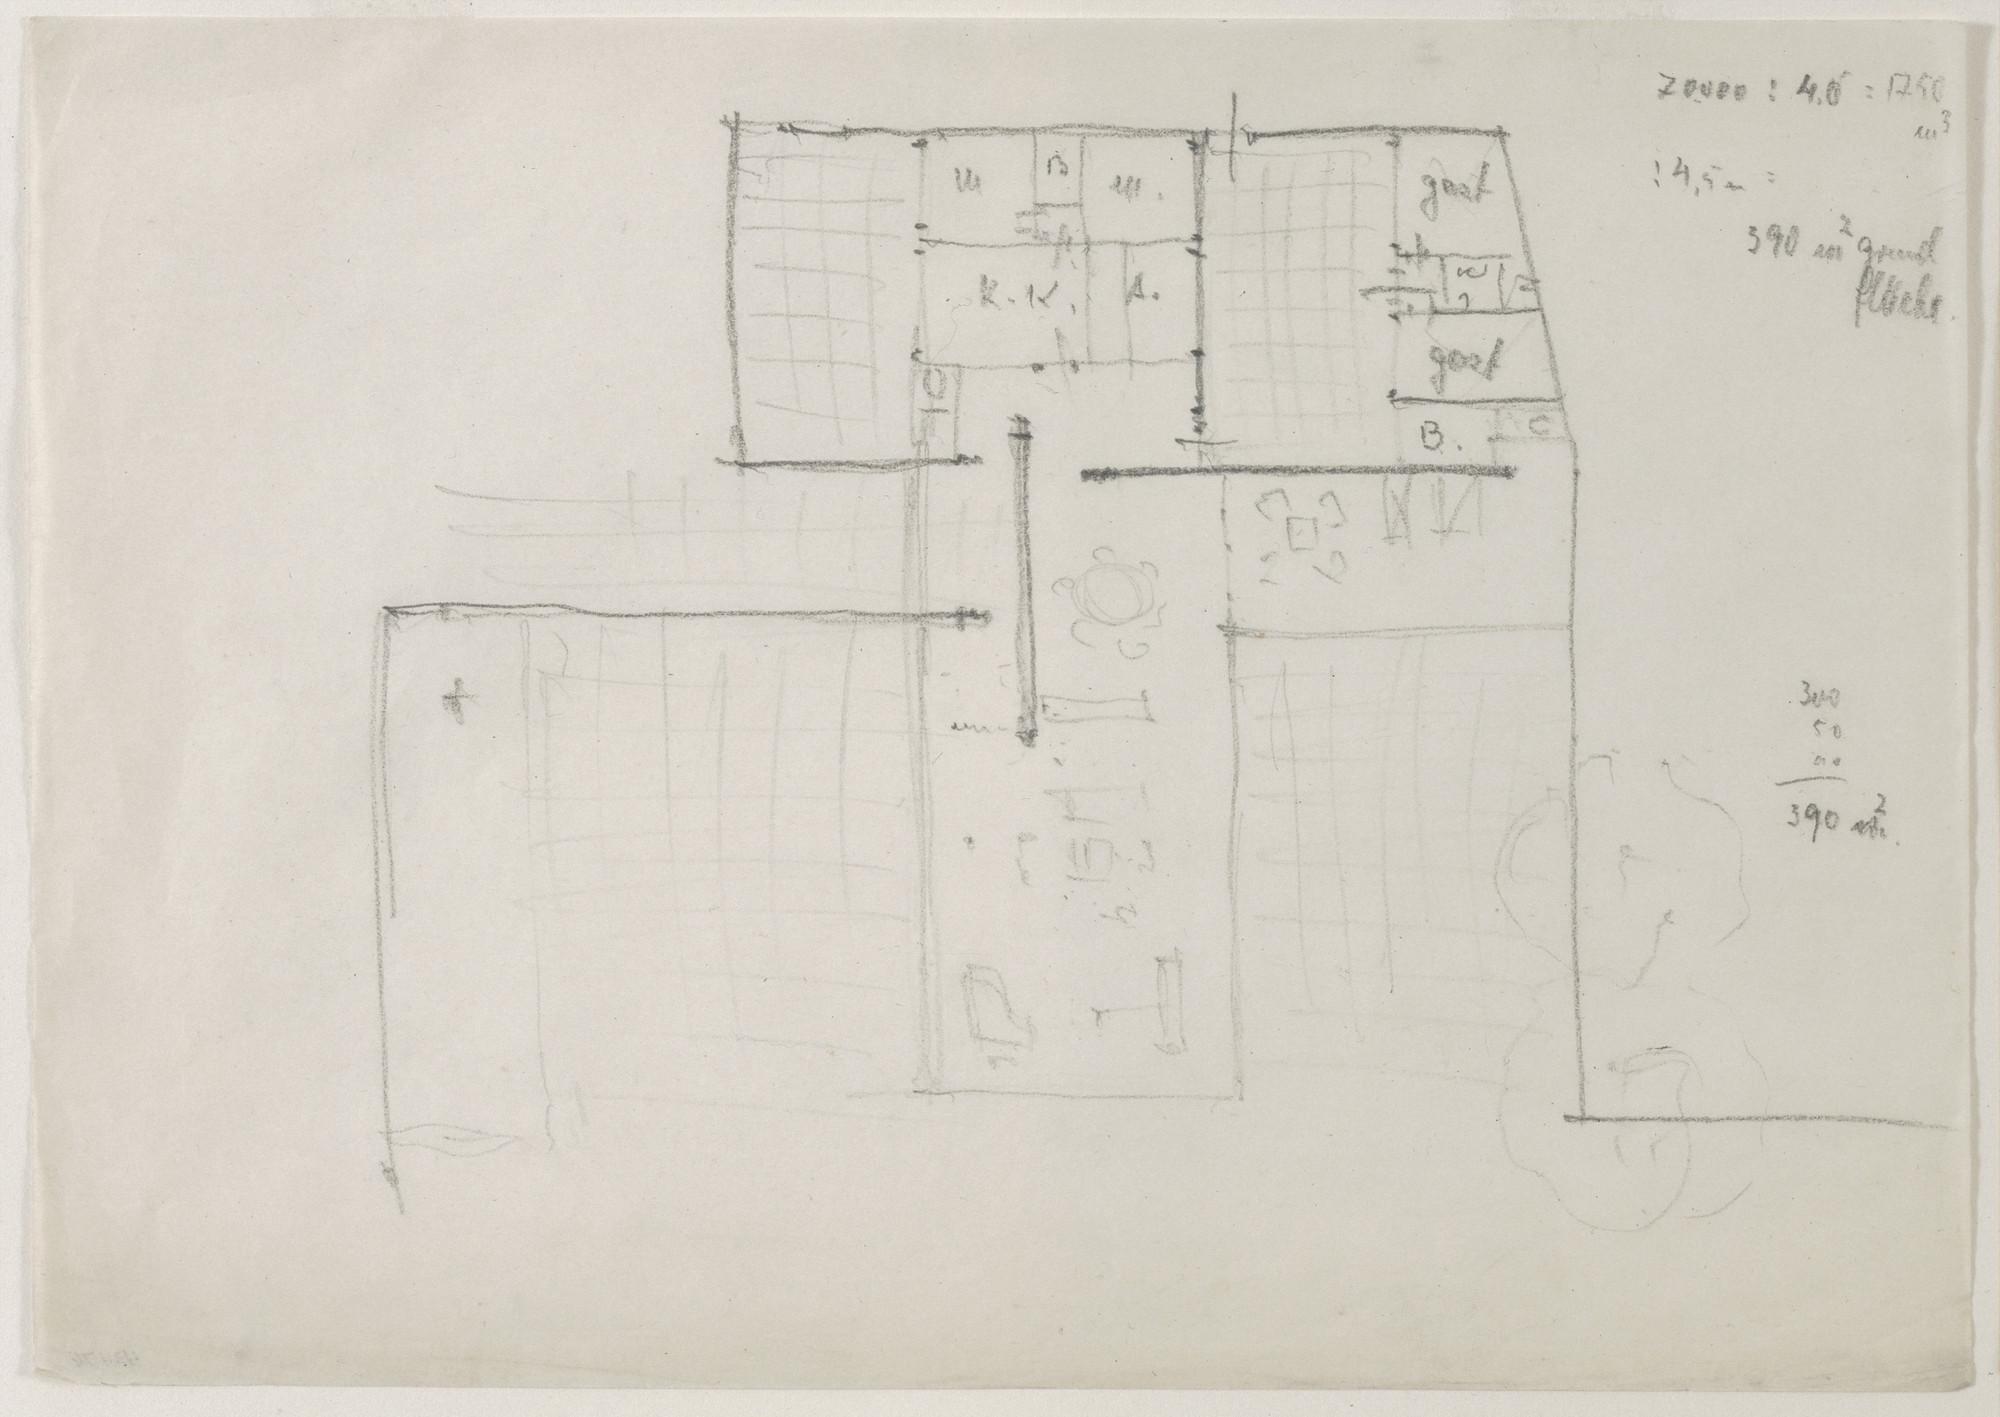 Ludwig Mies van der Rohe. Hubbe-related Study (Floor plan sketch). c.1934-1935 | MoMA